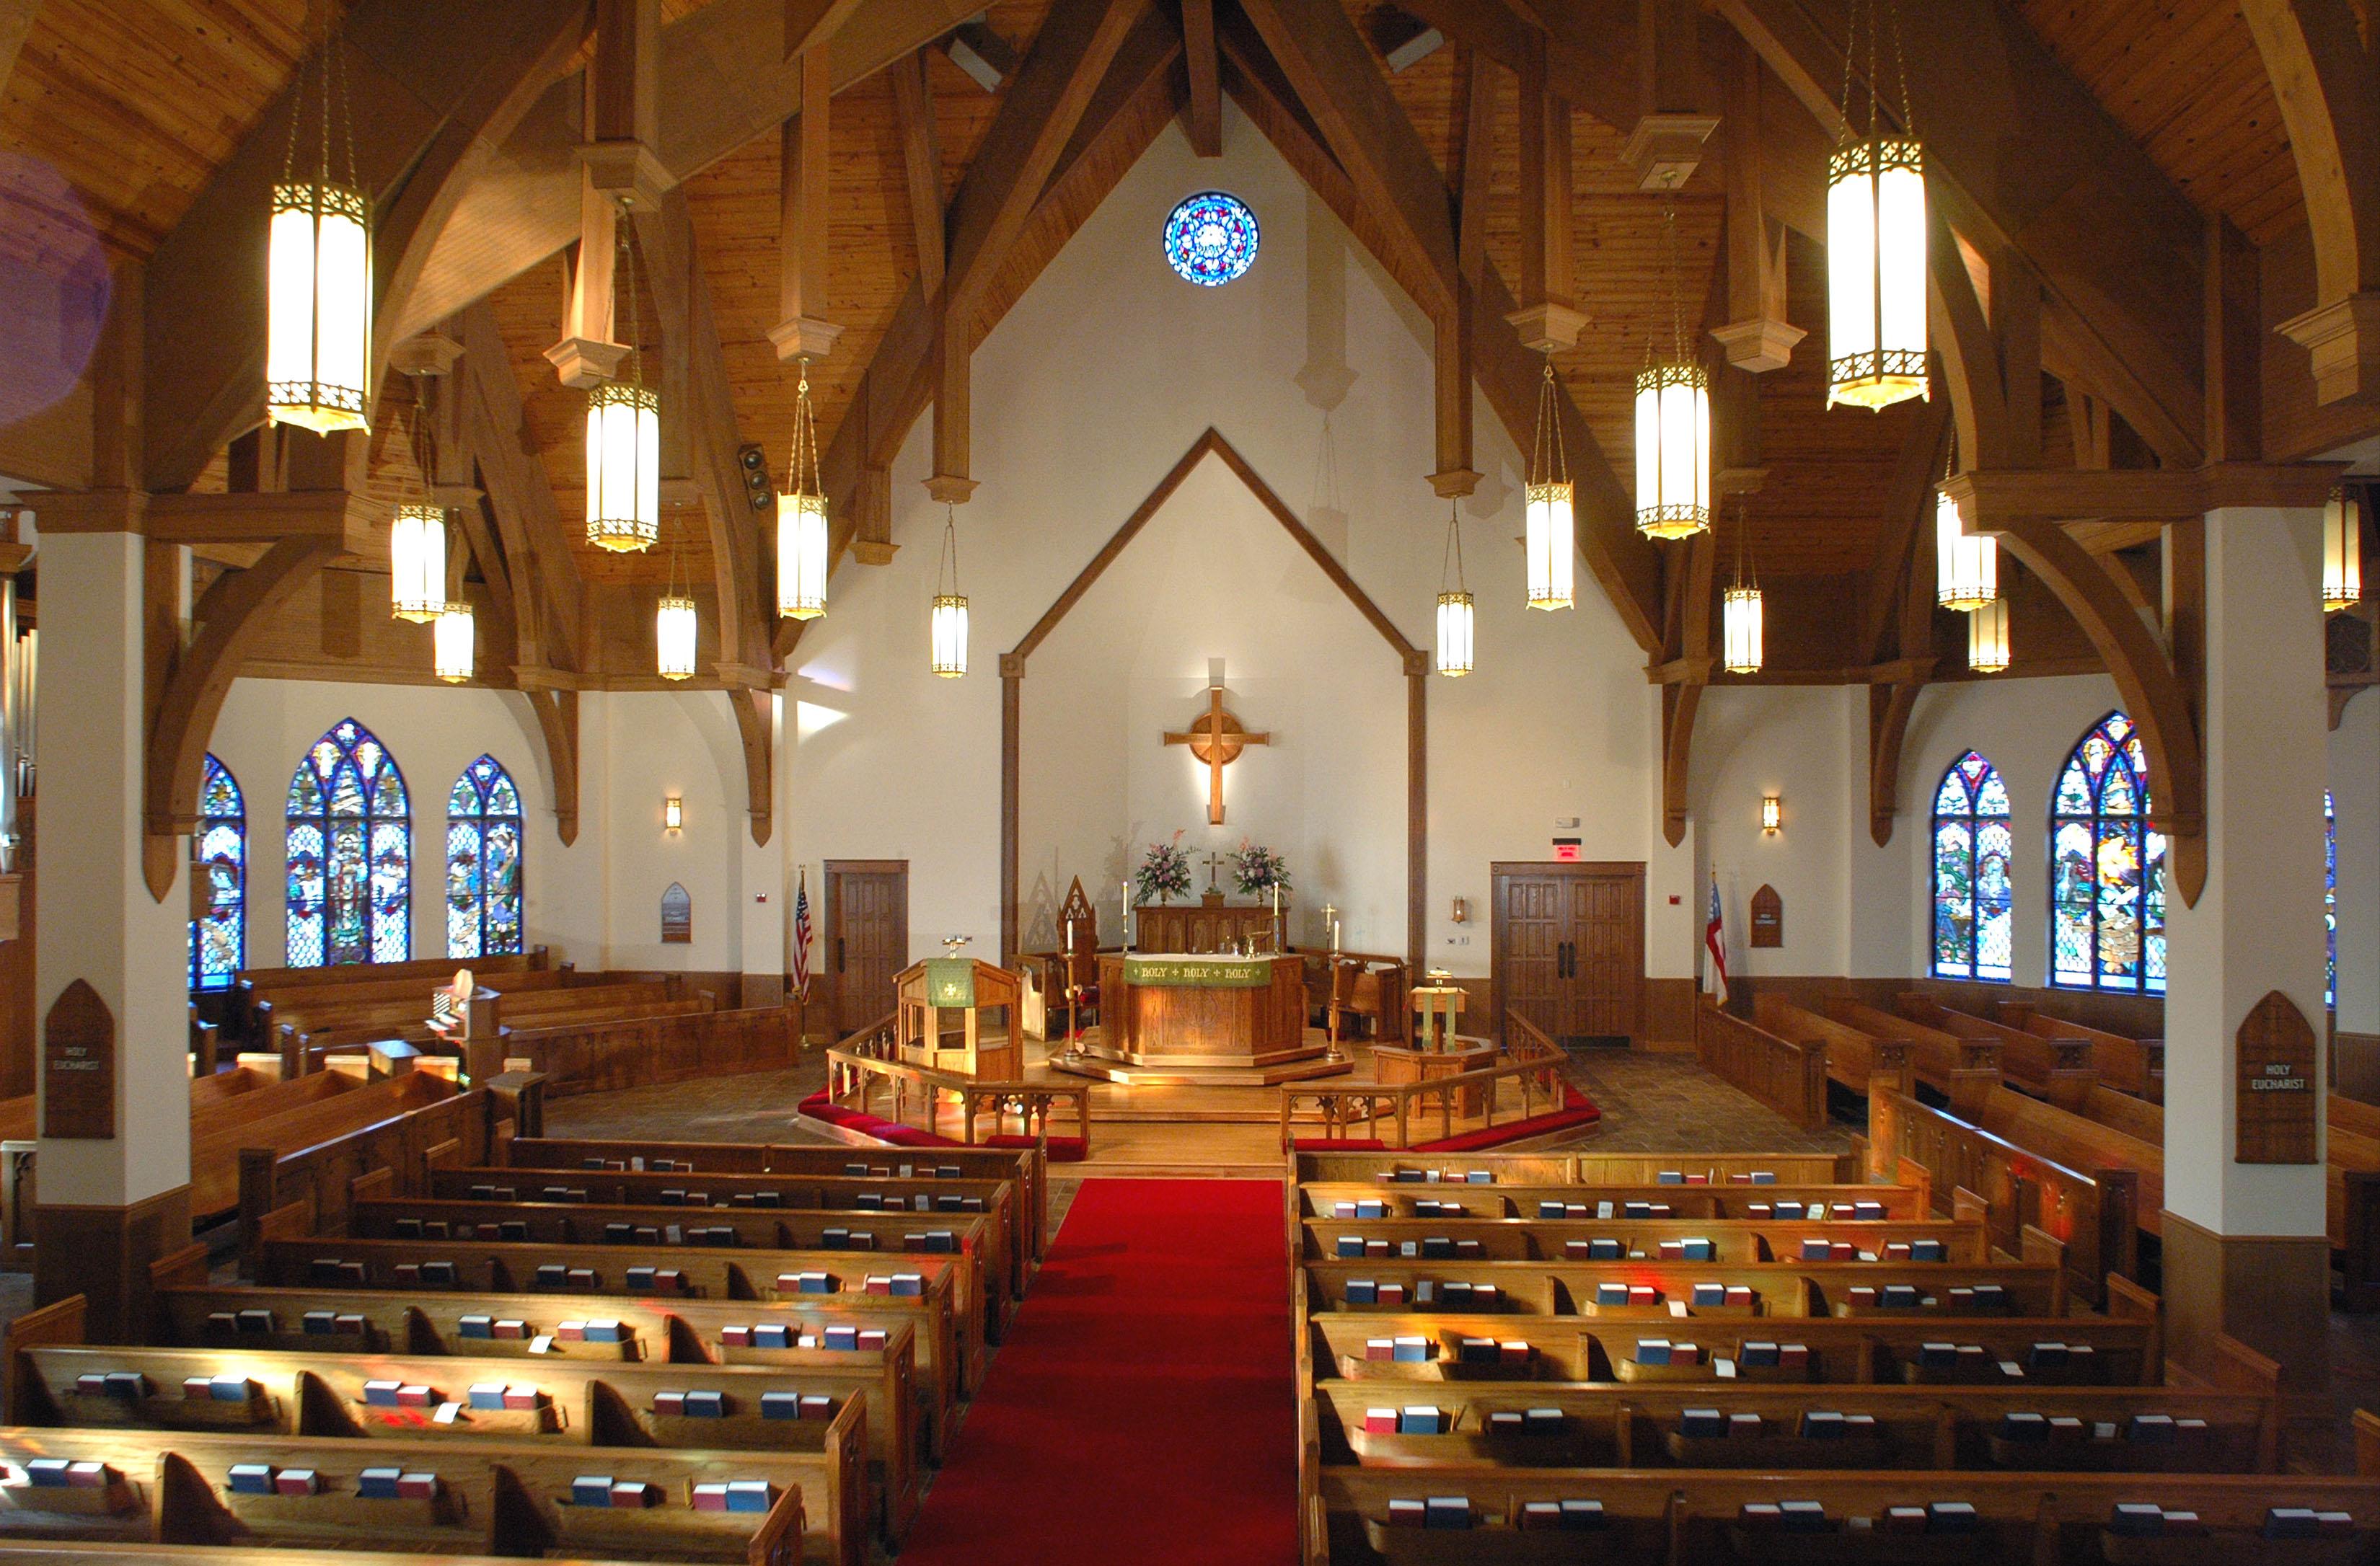 Church of the Redeemer Interior